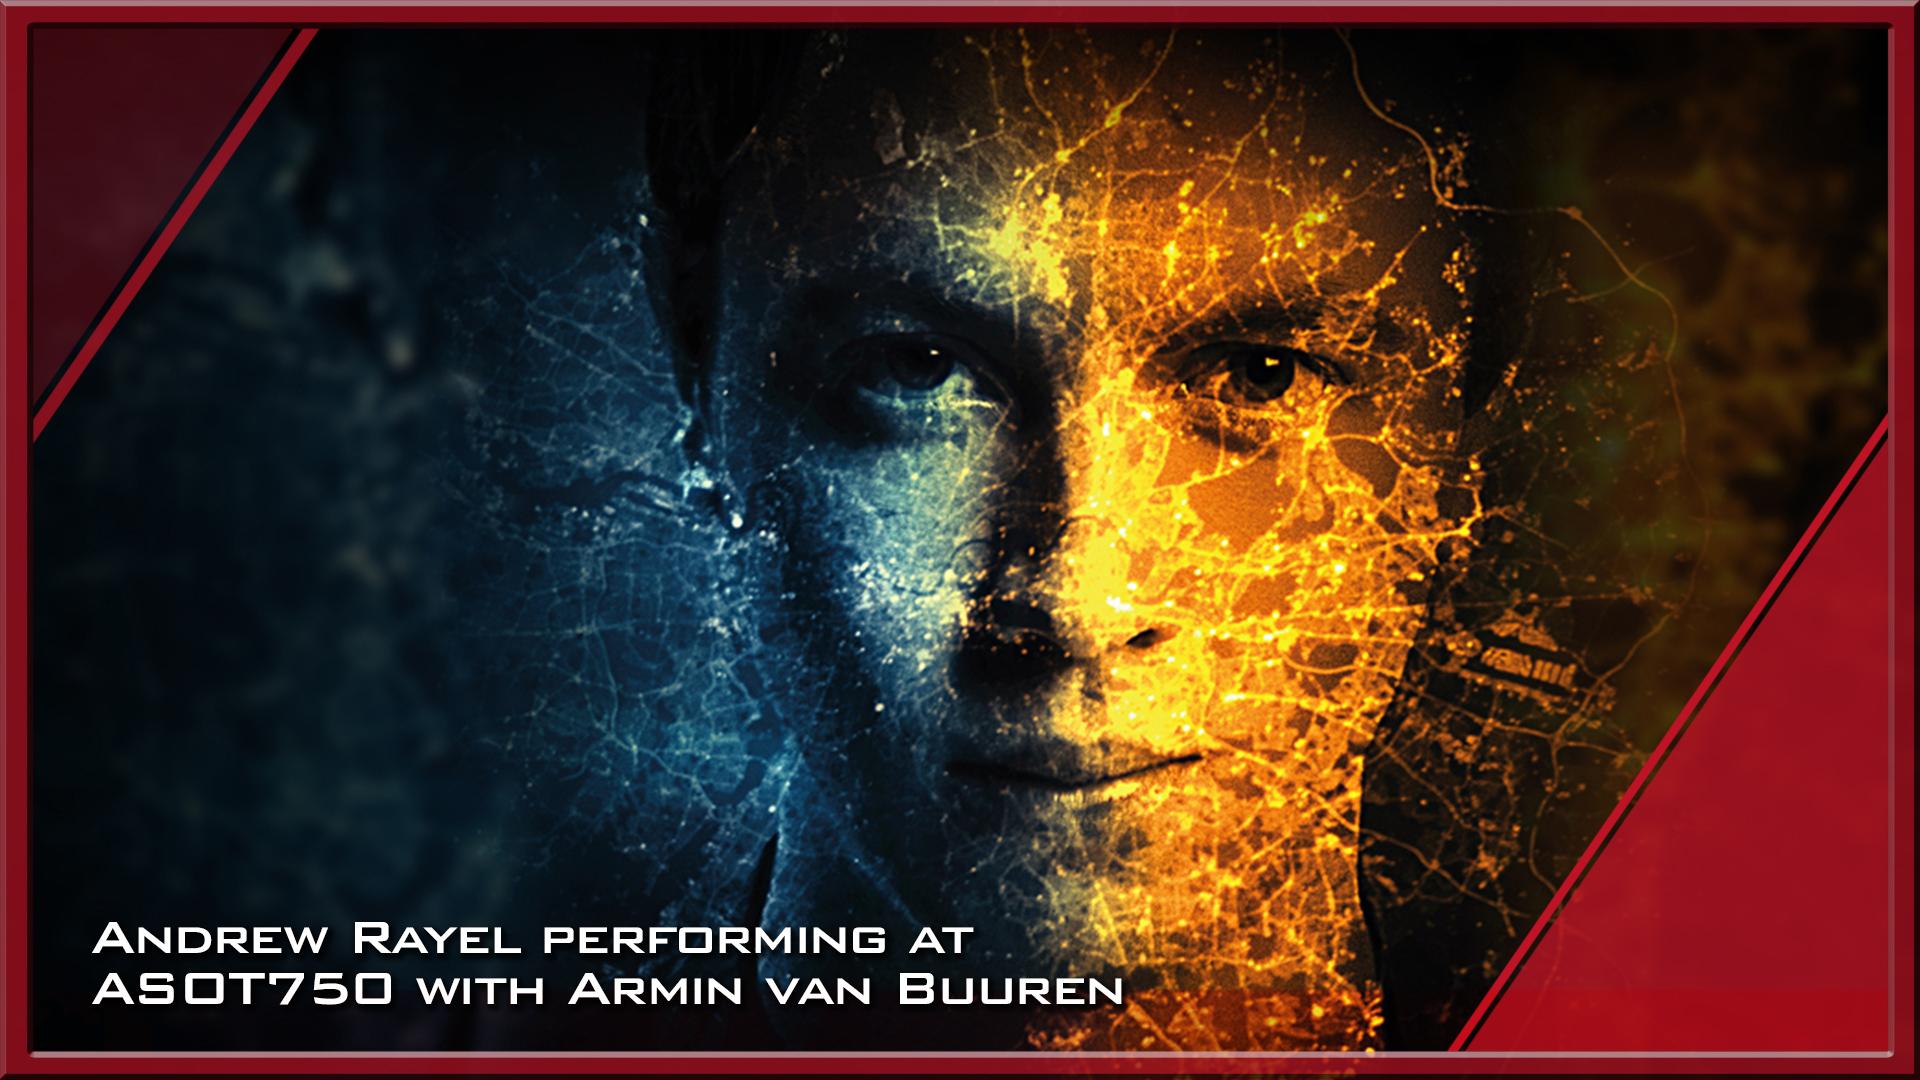 Andrew Rayel performing at ASOT750 with Armin van Buuren